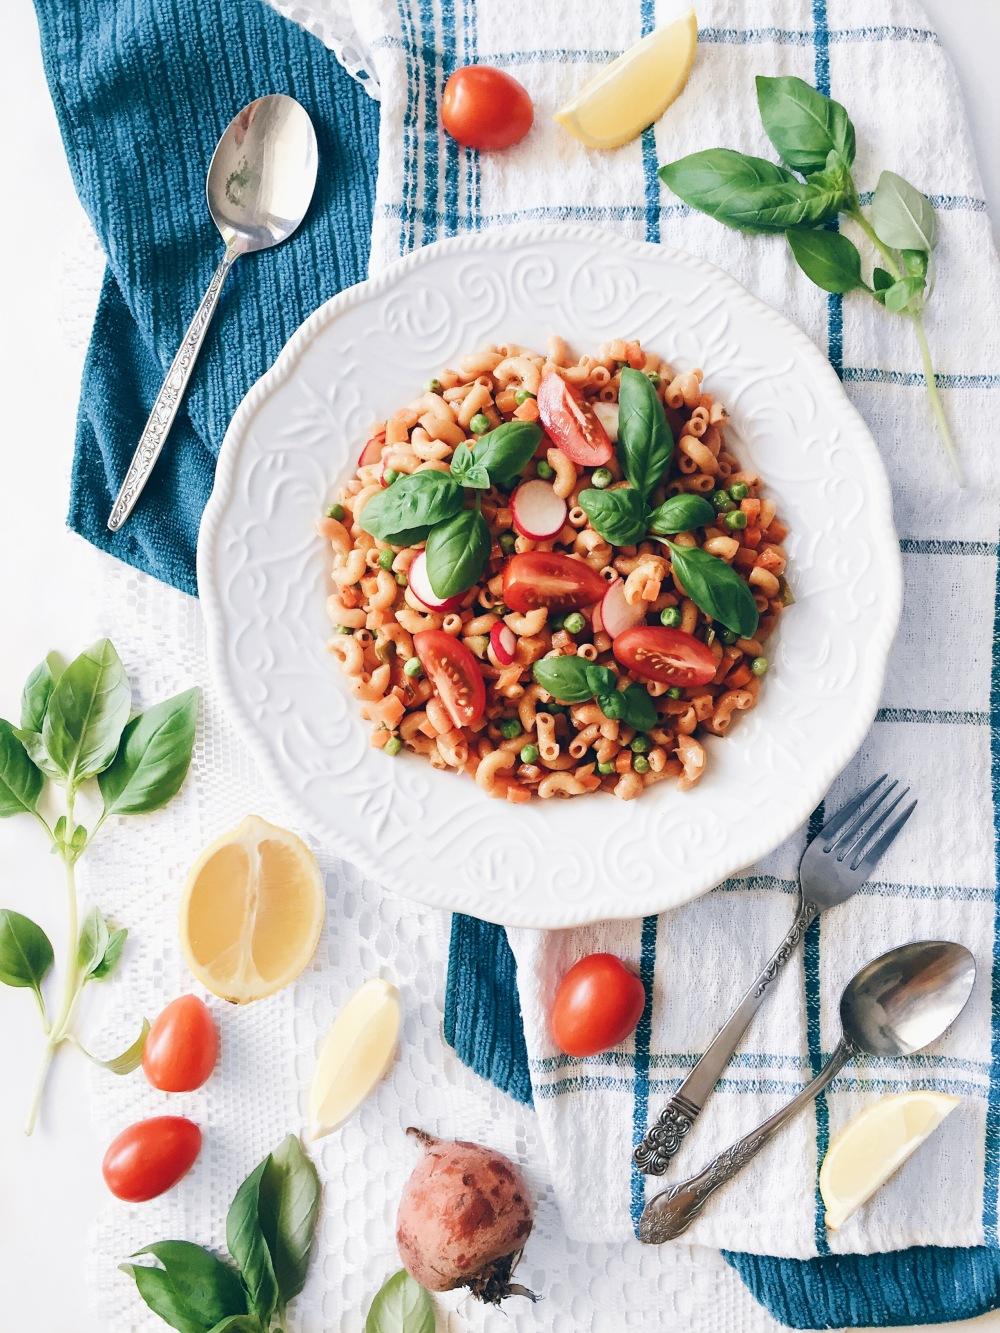 macaronis aux betteraves, carottes, petits pois, radis, tomates et basilic